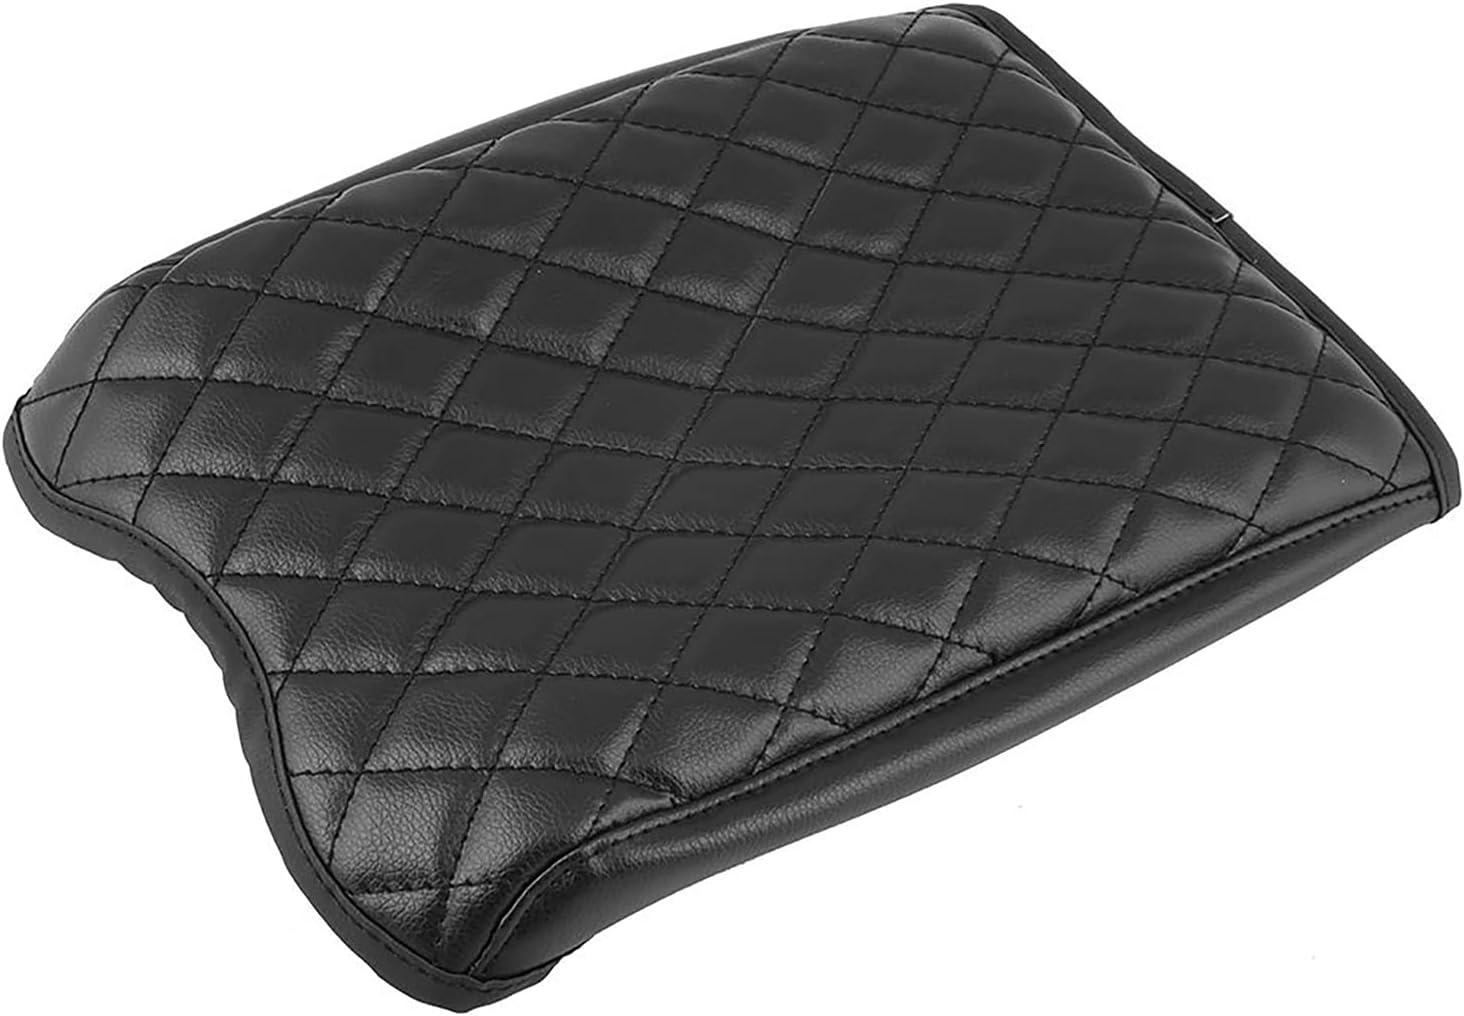 YoumiGO Vehicle Universal Armrest Pad Dur PU Waterproof Limited price sale Leather favorite